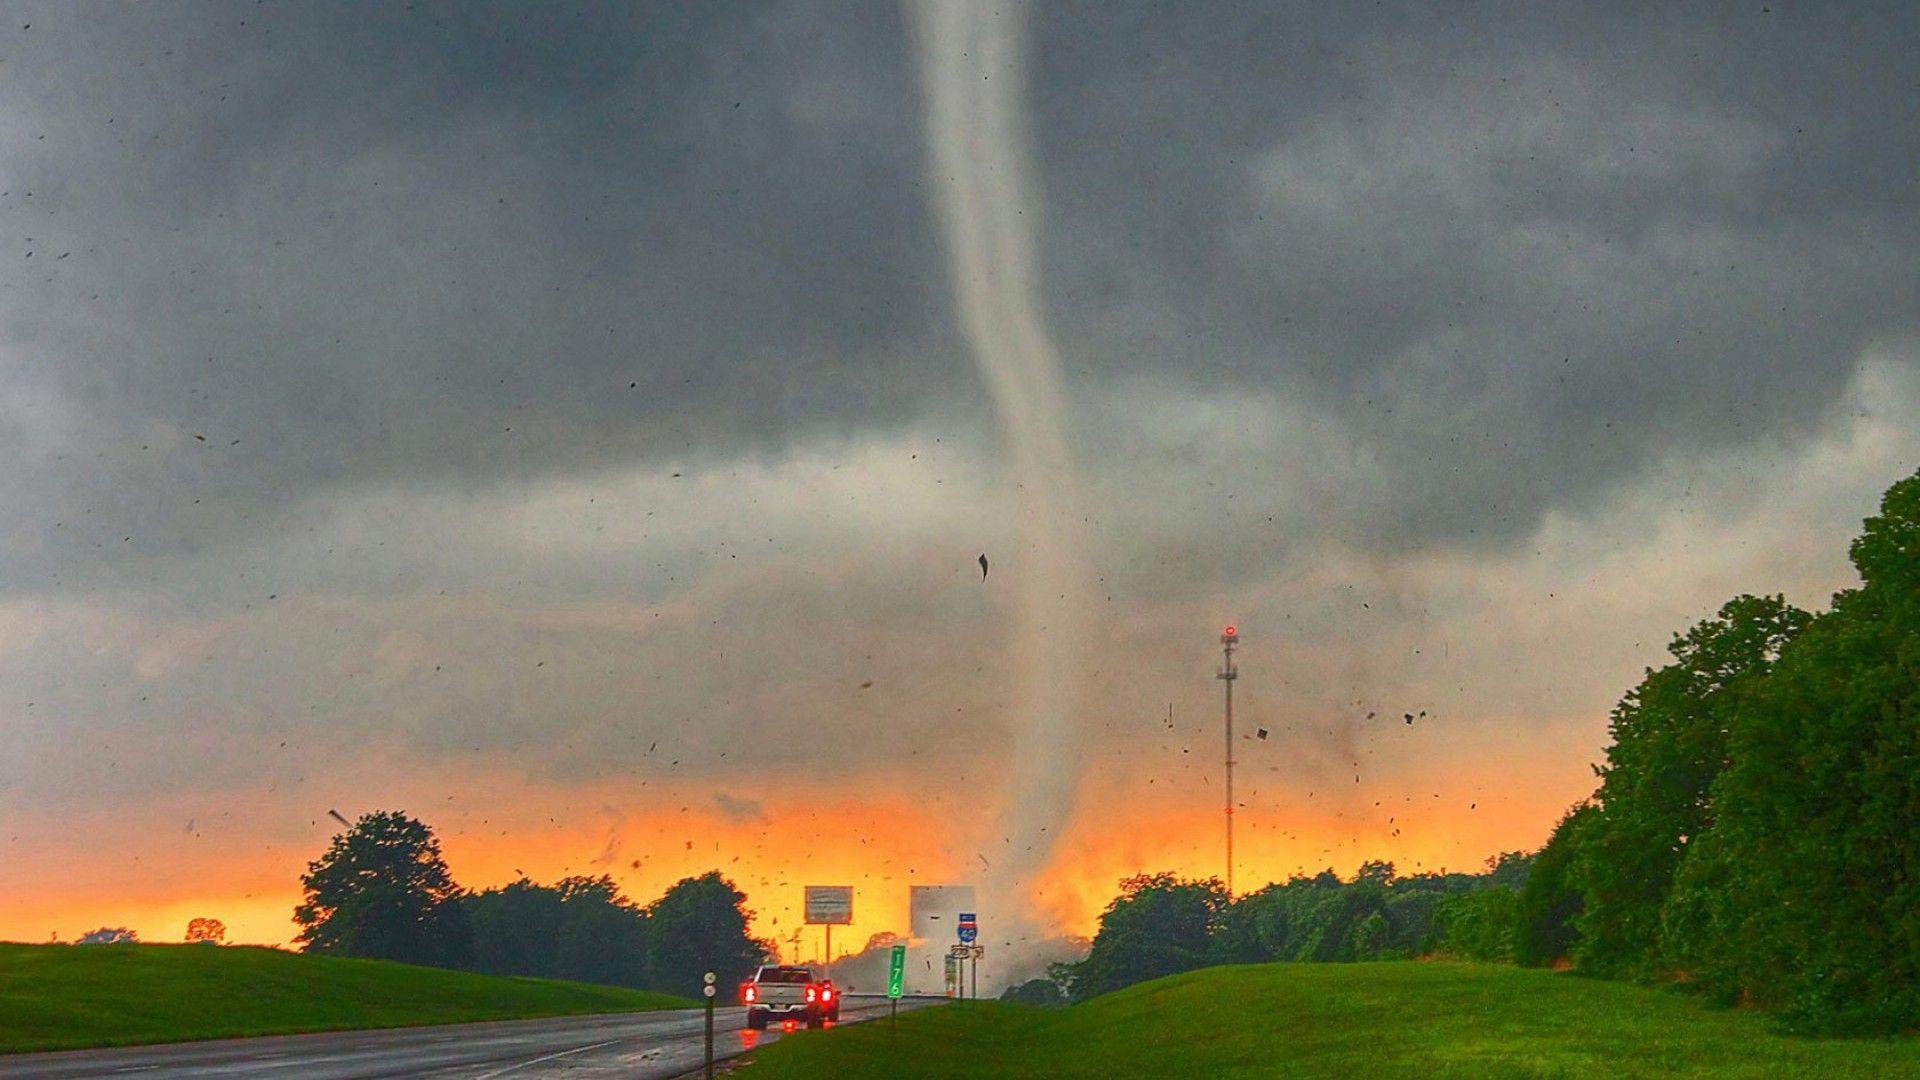 tornado images incoming search terms oklahoma tornado tornados 1920x1080